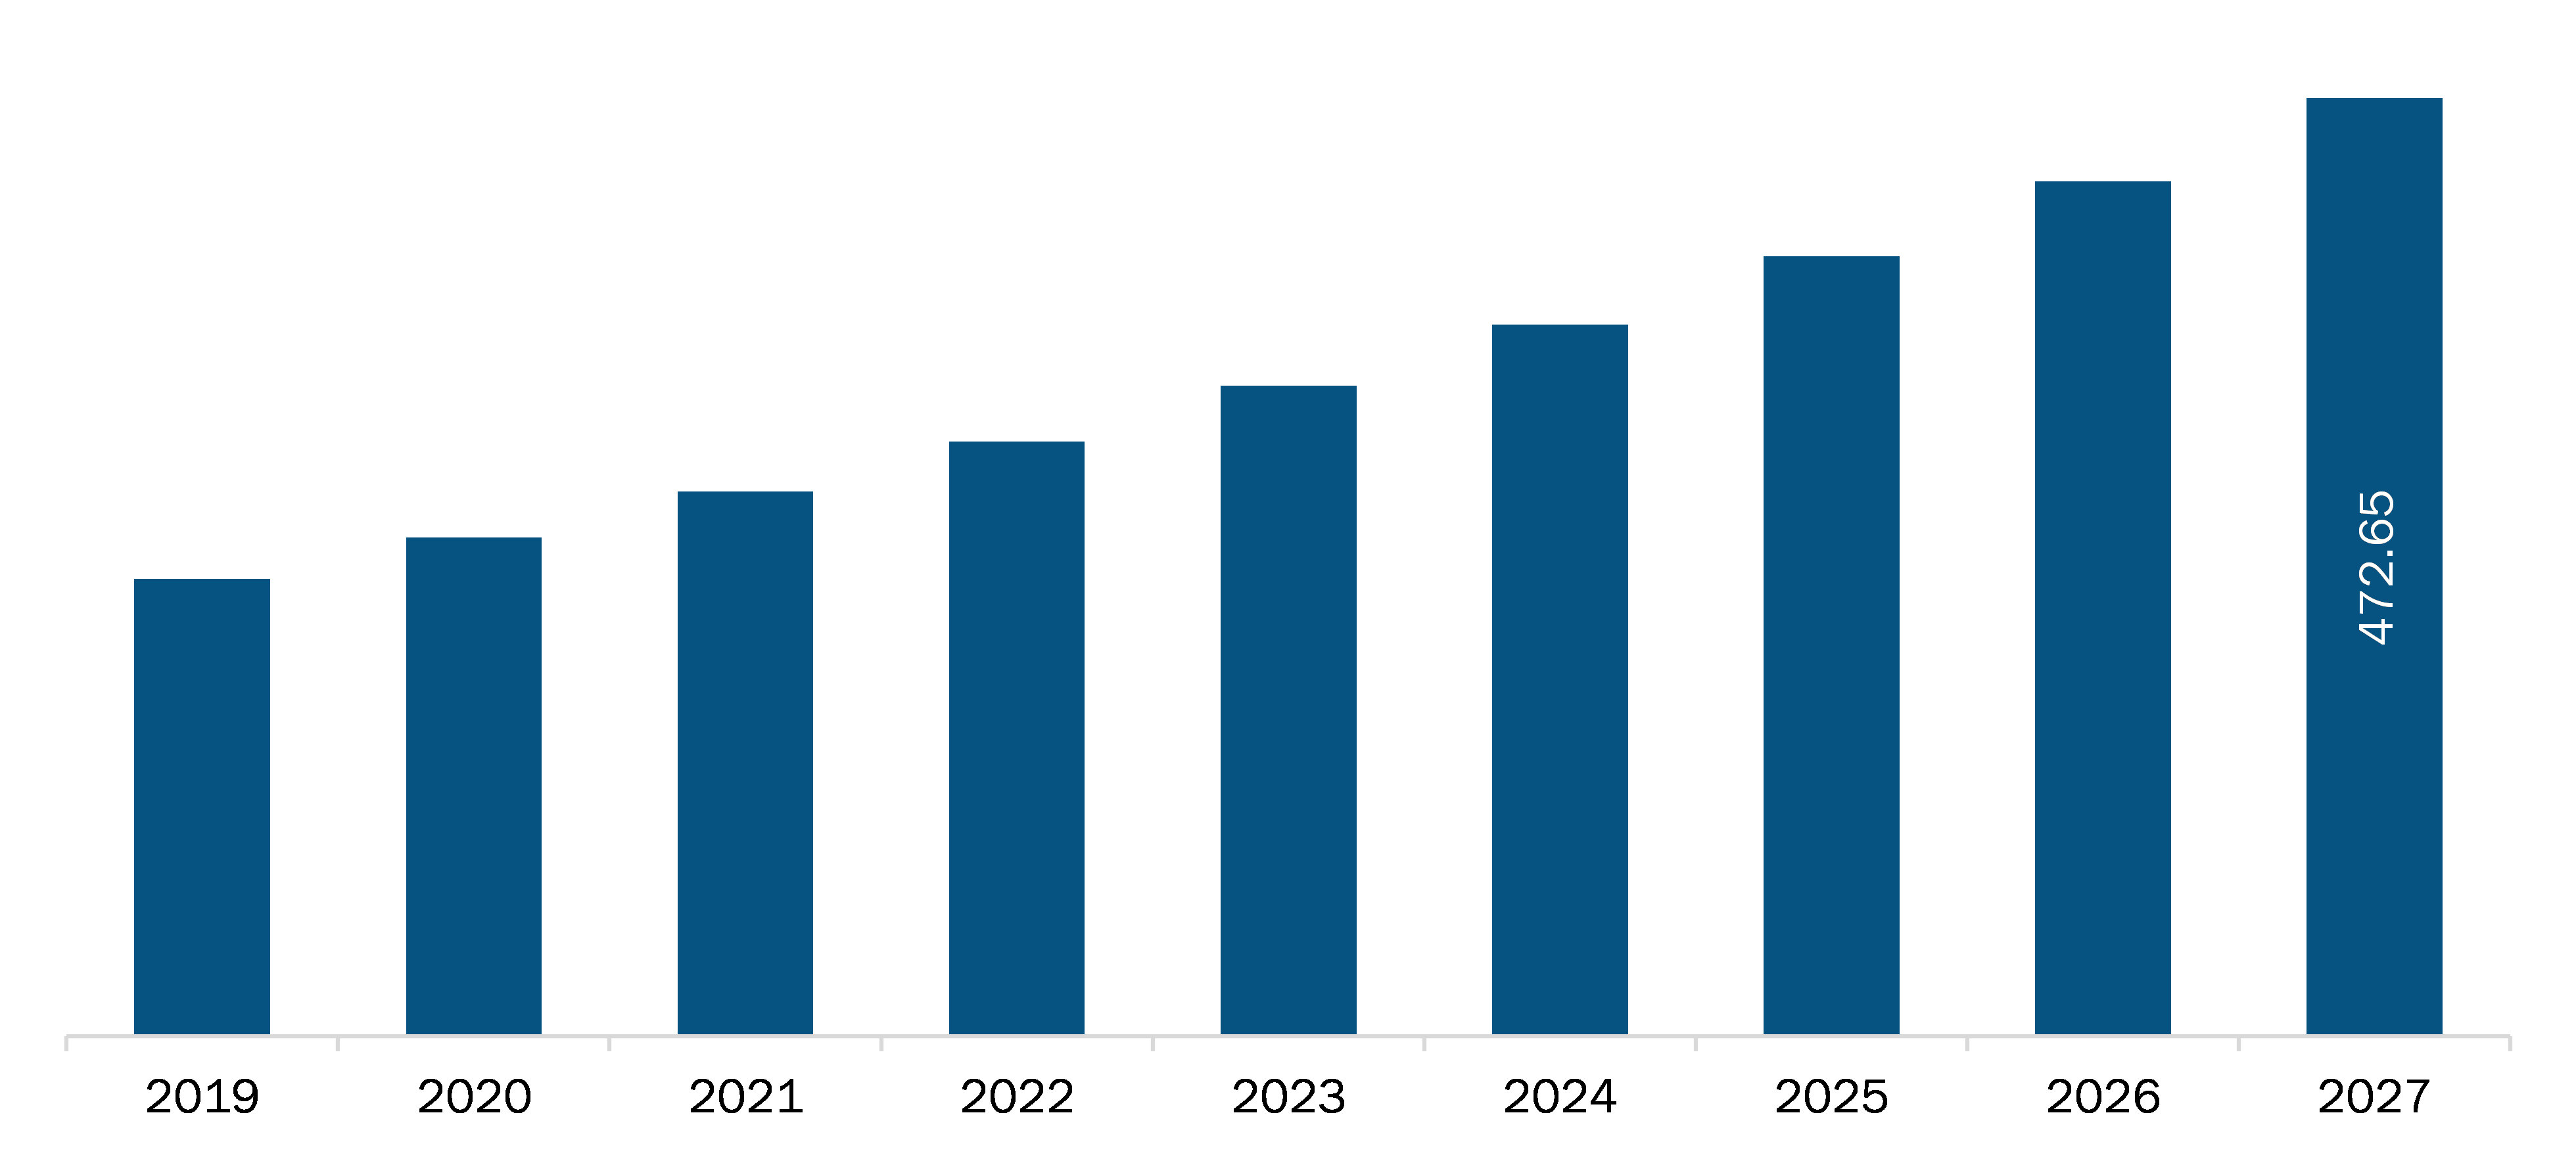 India Chronic Cough Market Revenue and Forecast to 2027 (US$ Million)